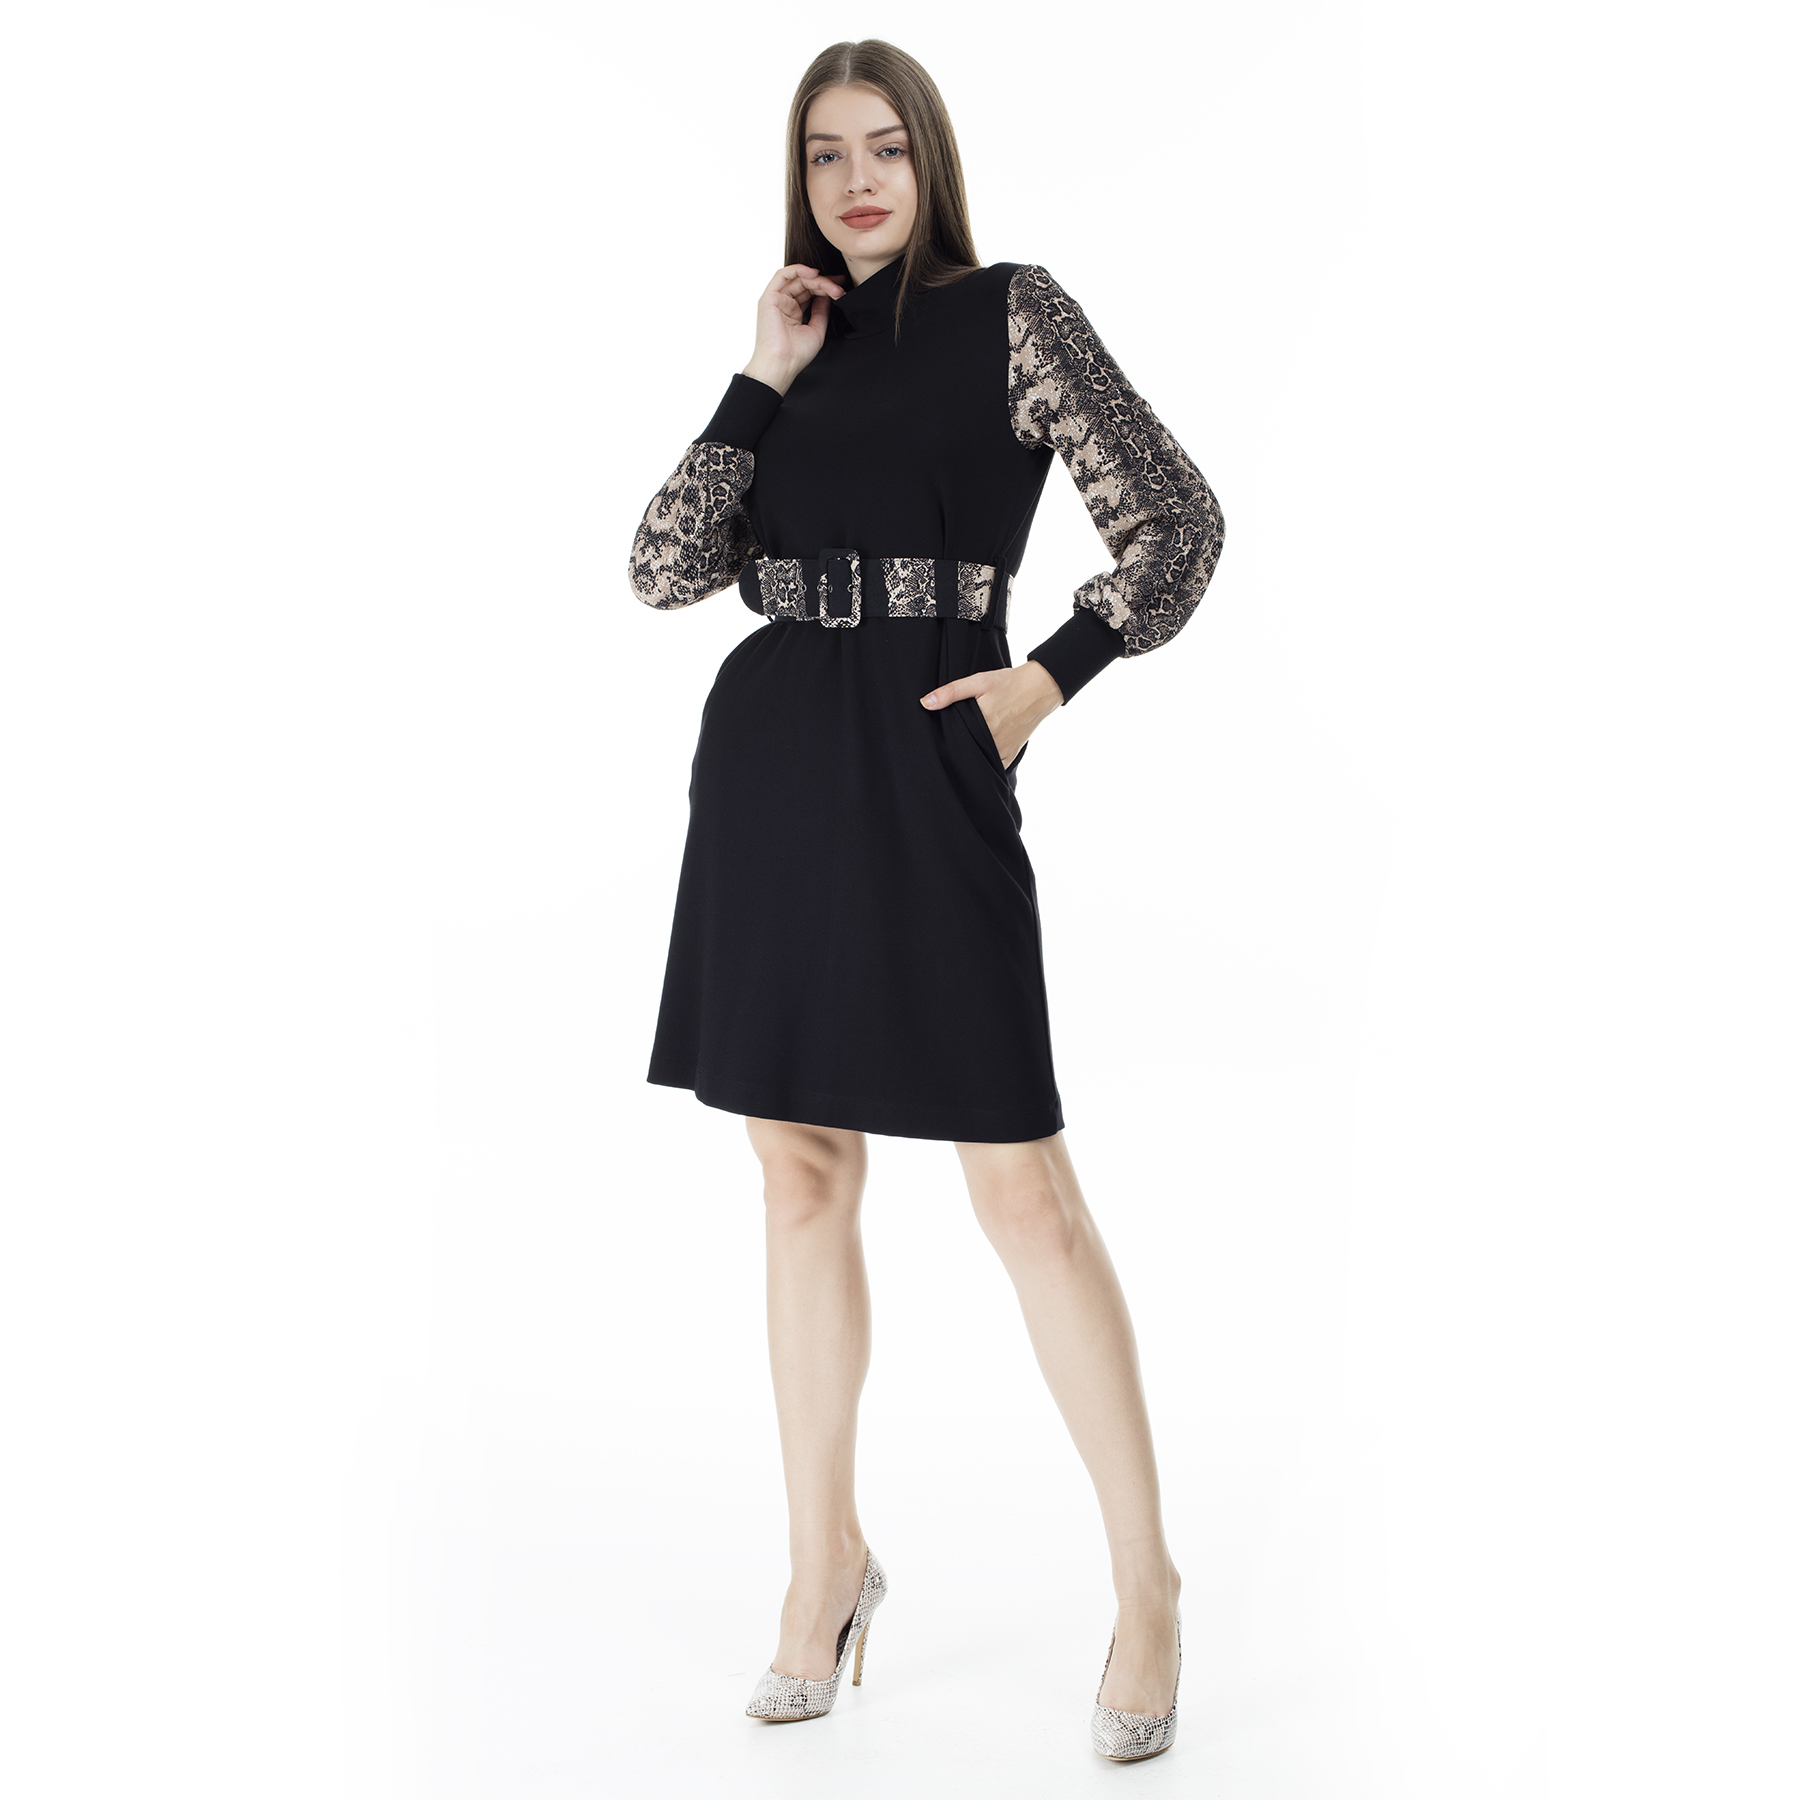 Via Dante Snake Skin Print Arched Dress WOMEN DRESS 1033519VD